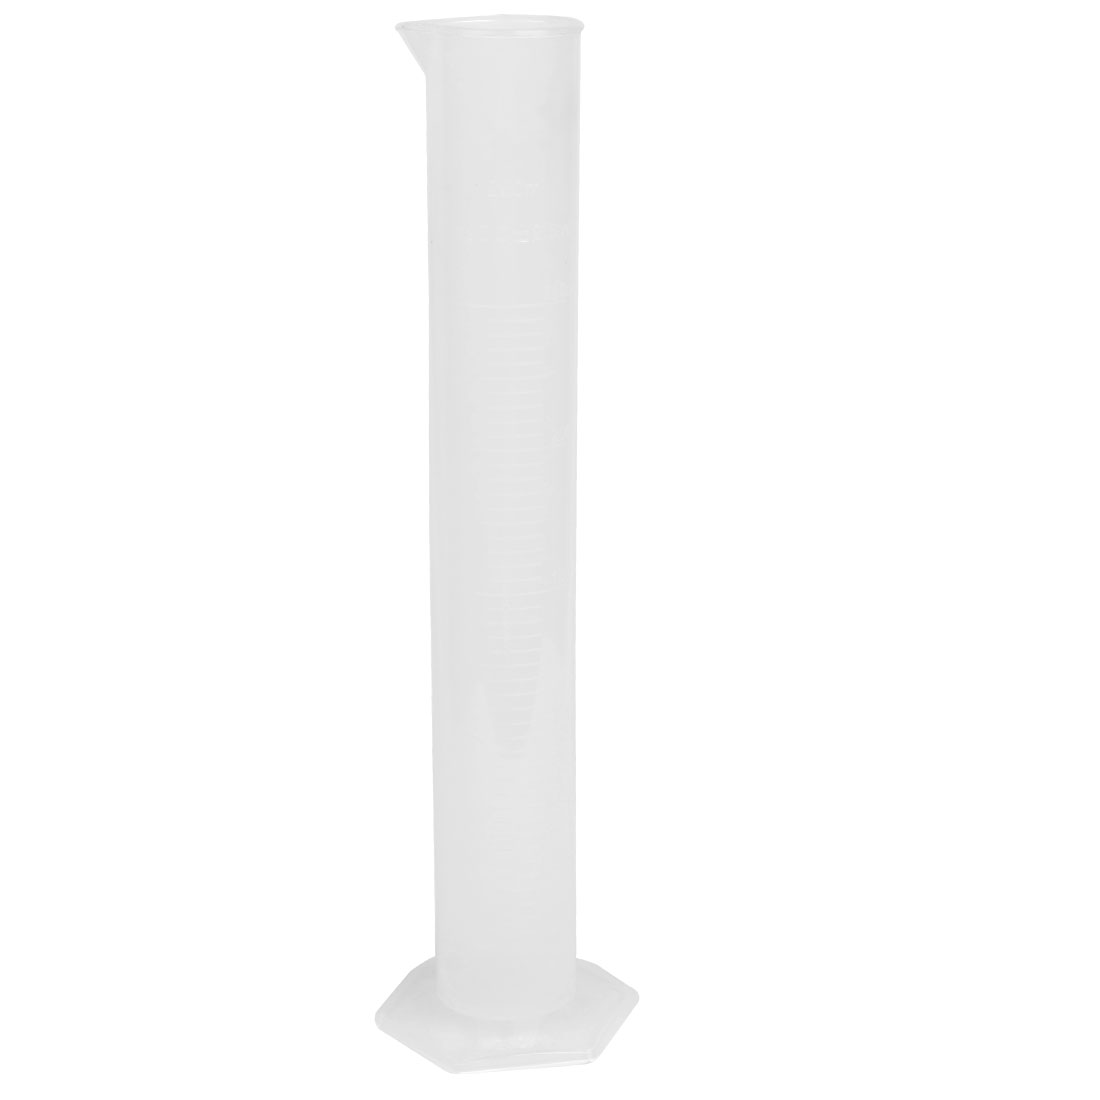 250mL Capacity Liquid Measurement Tool Clear White Graduated Cylinder